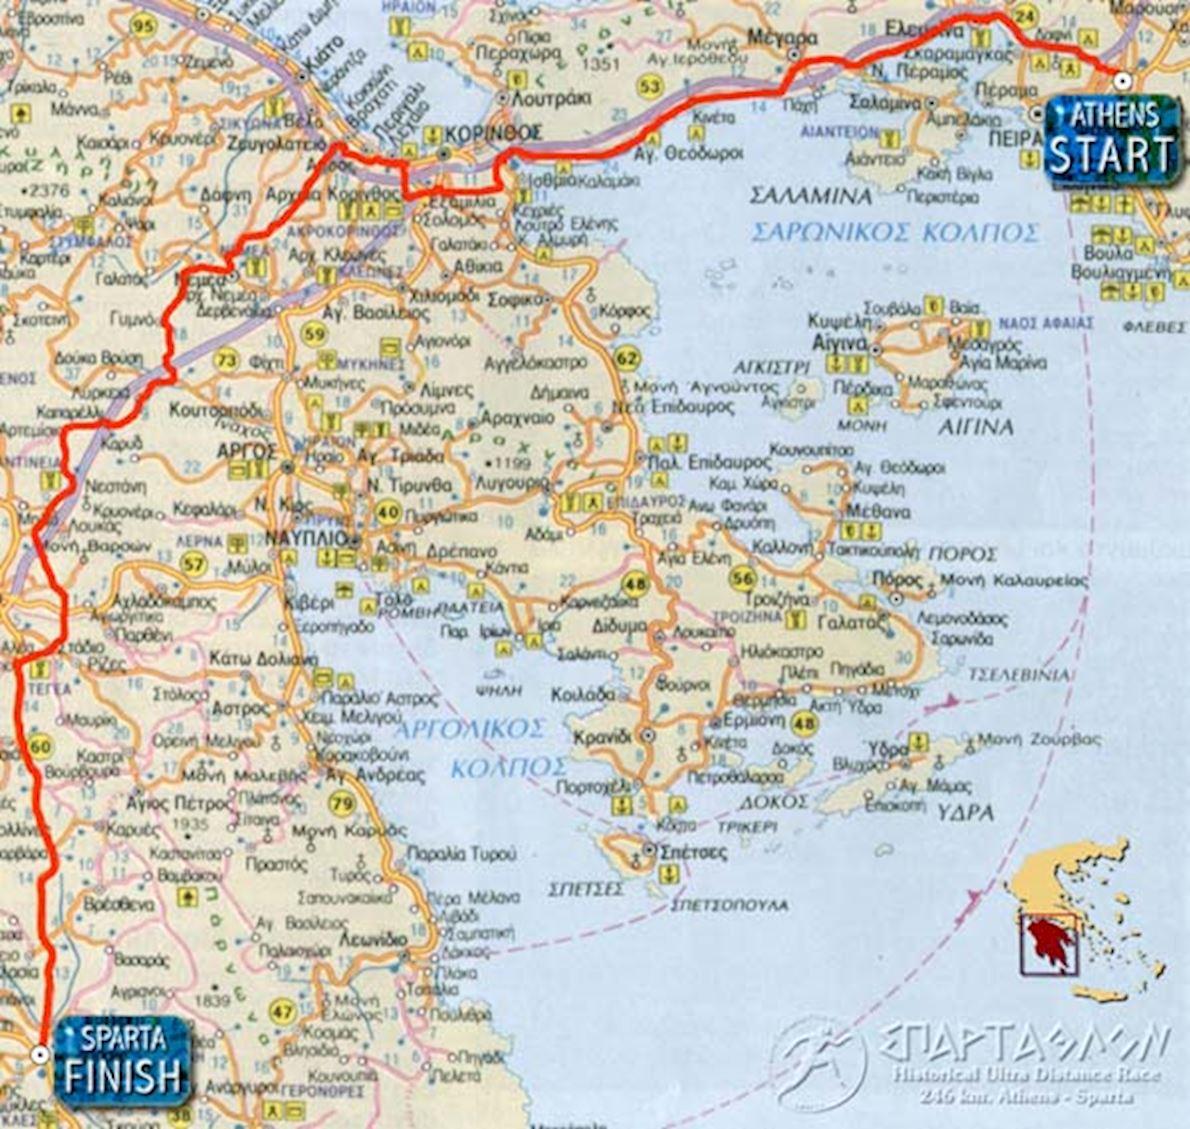 Spartathlon Route Map